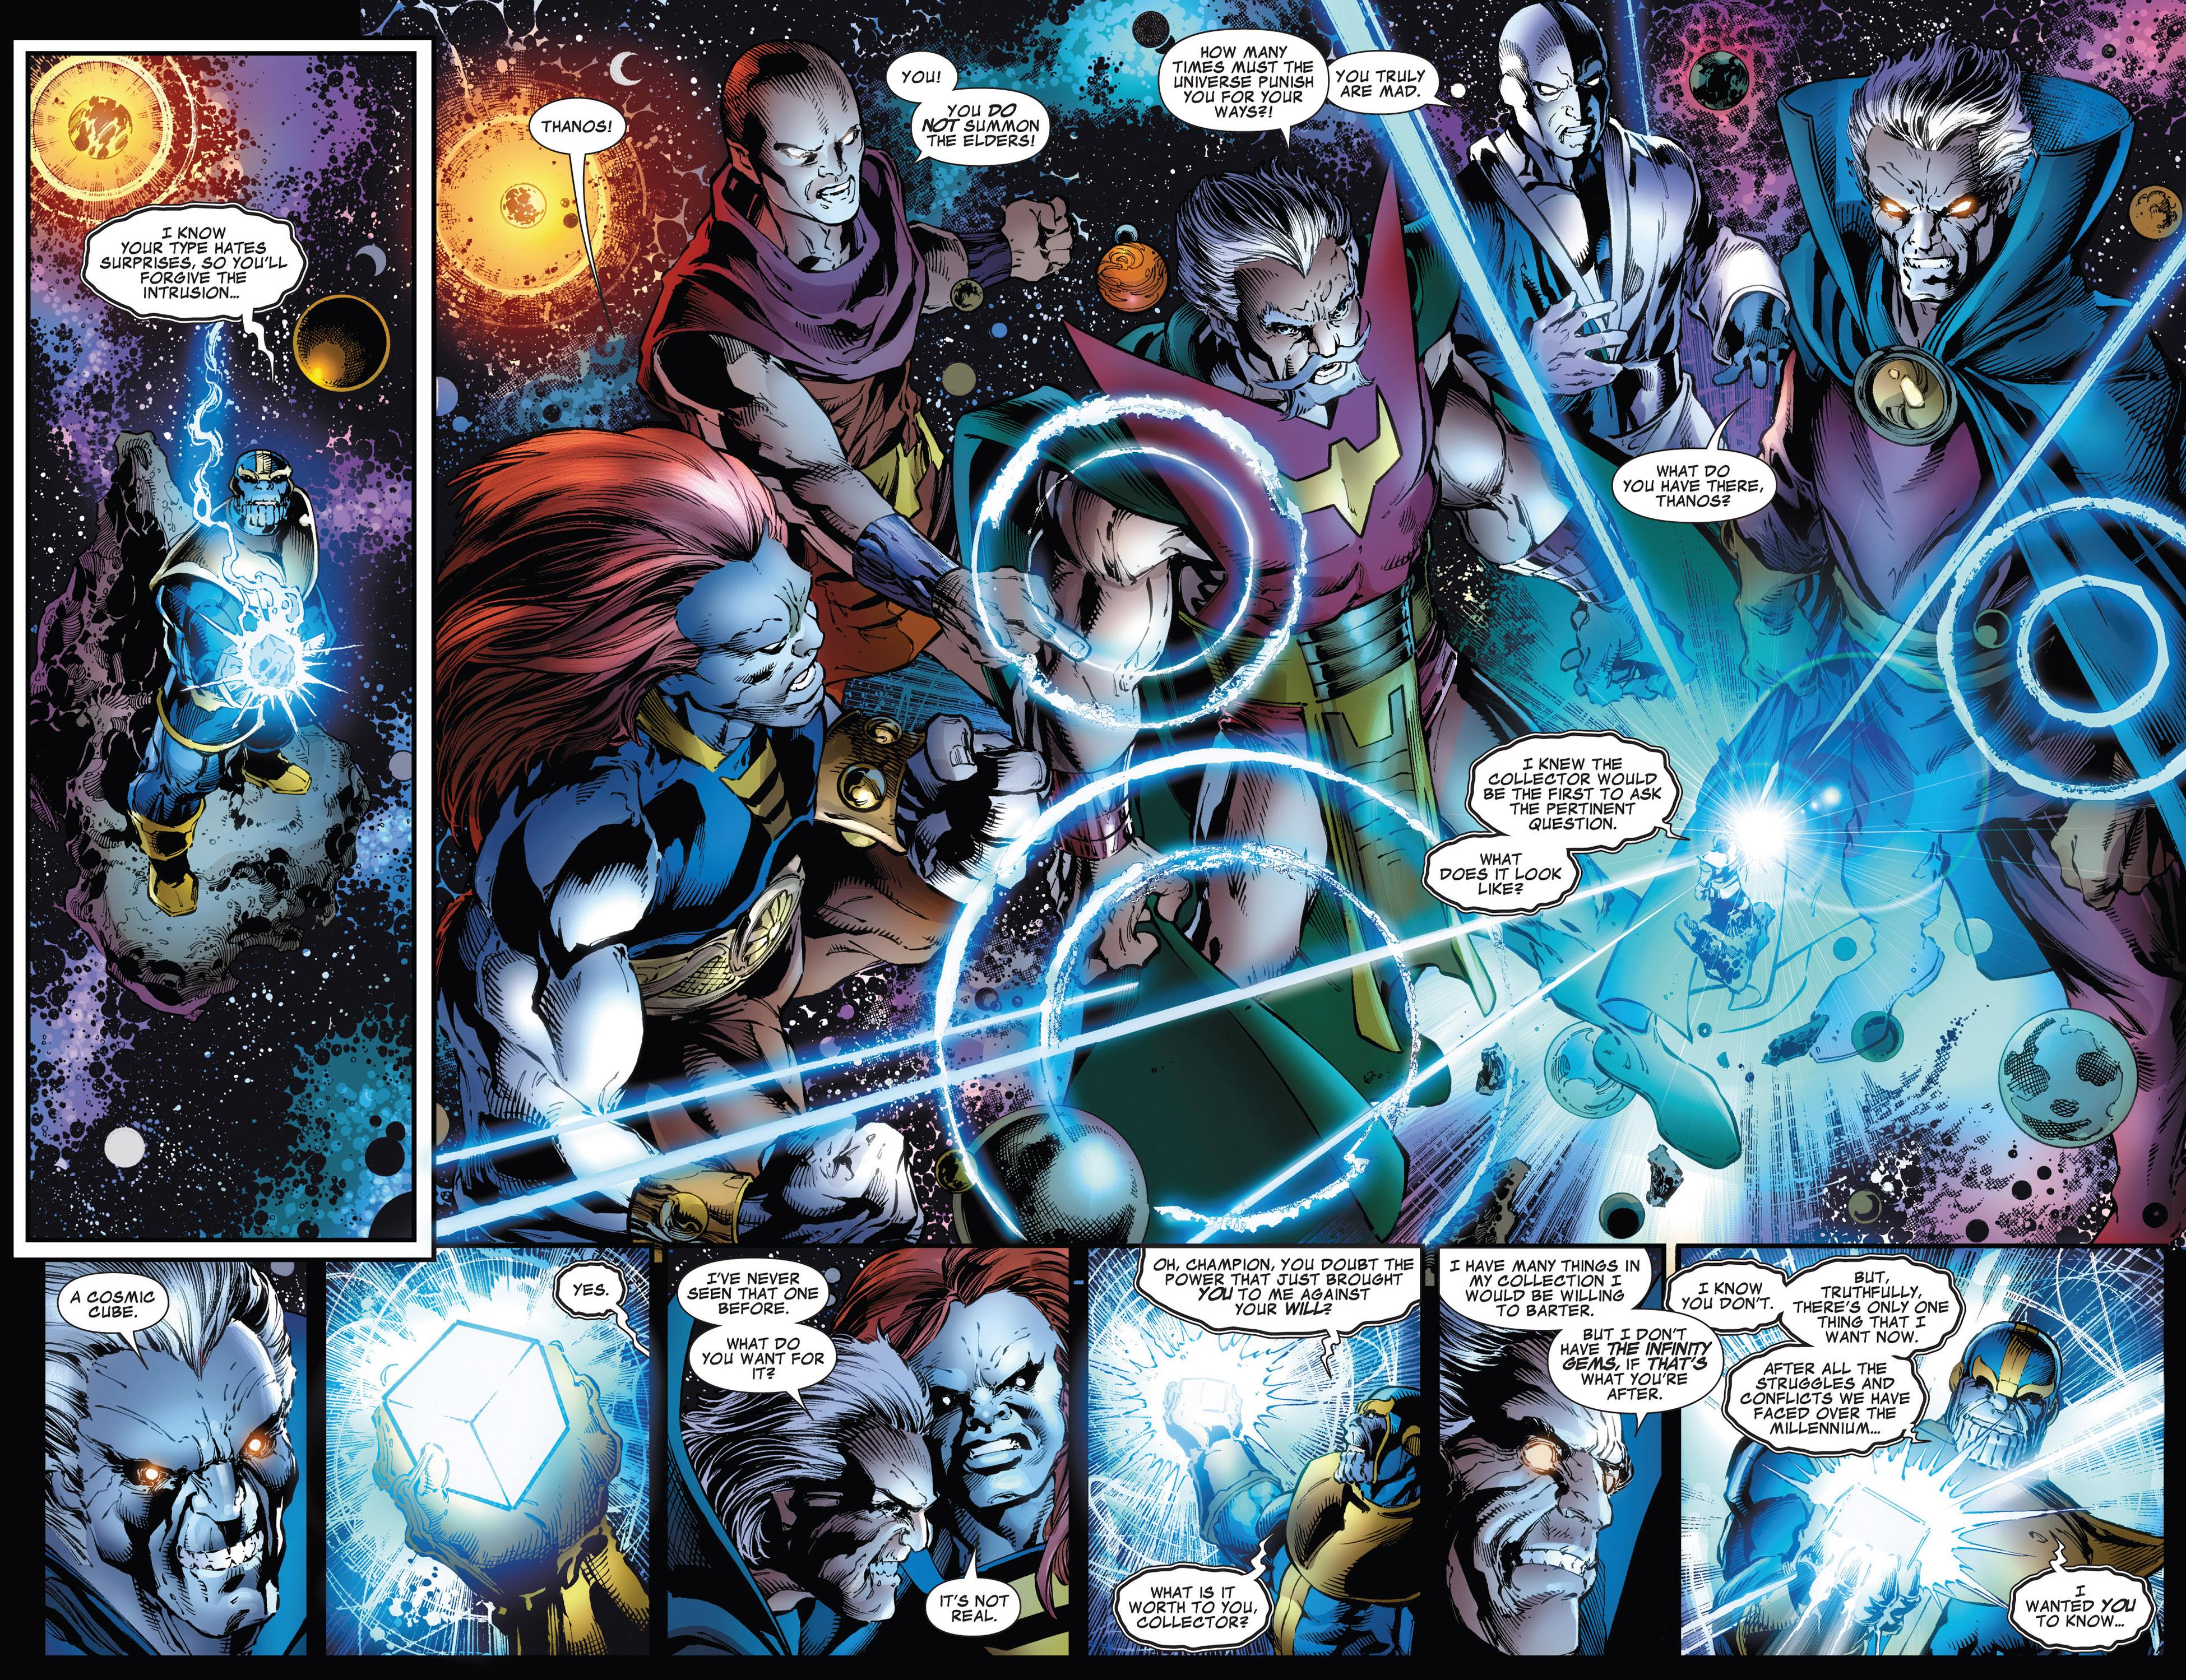 Avengers Assemble (2012) 7 Page 2